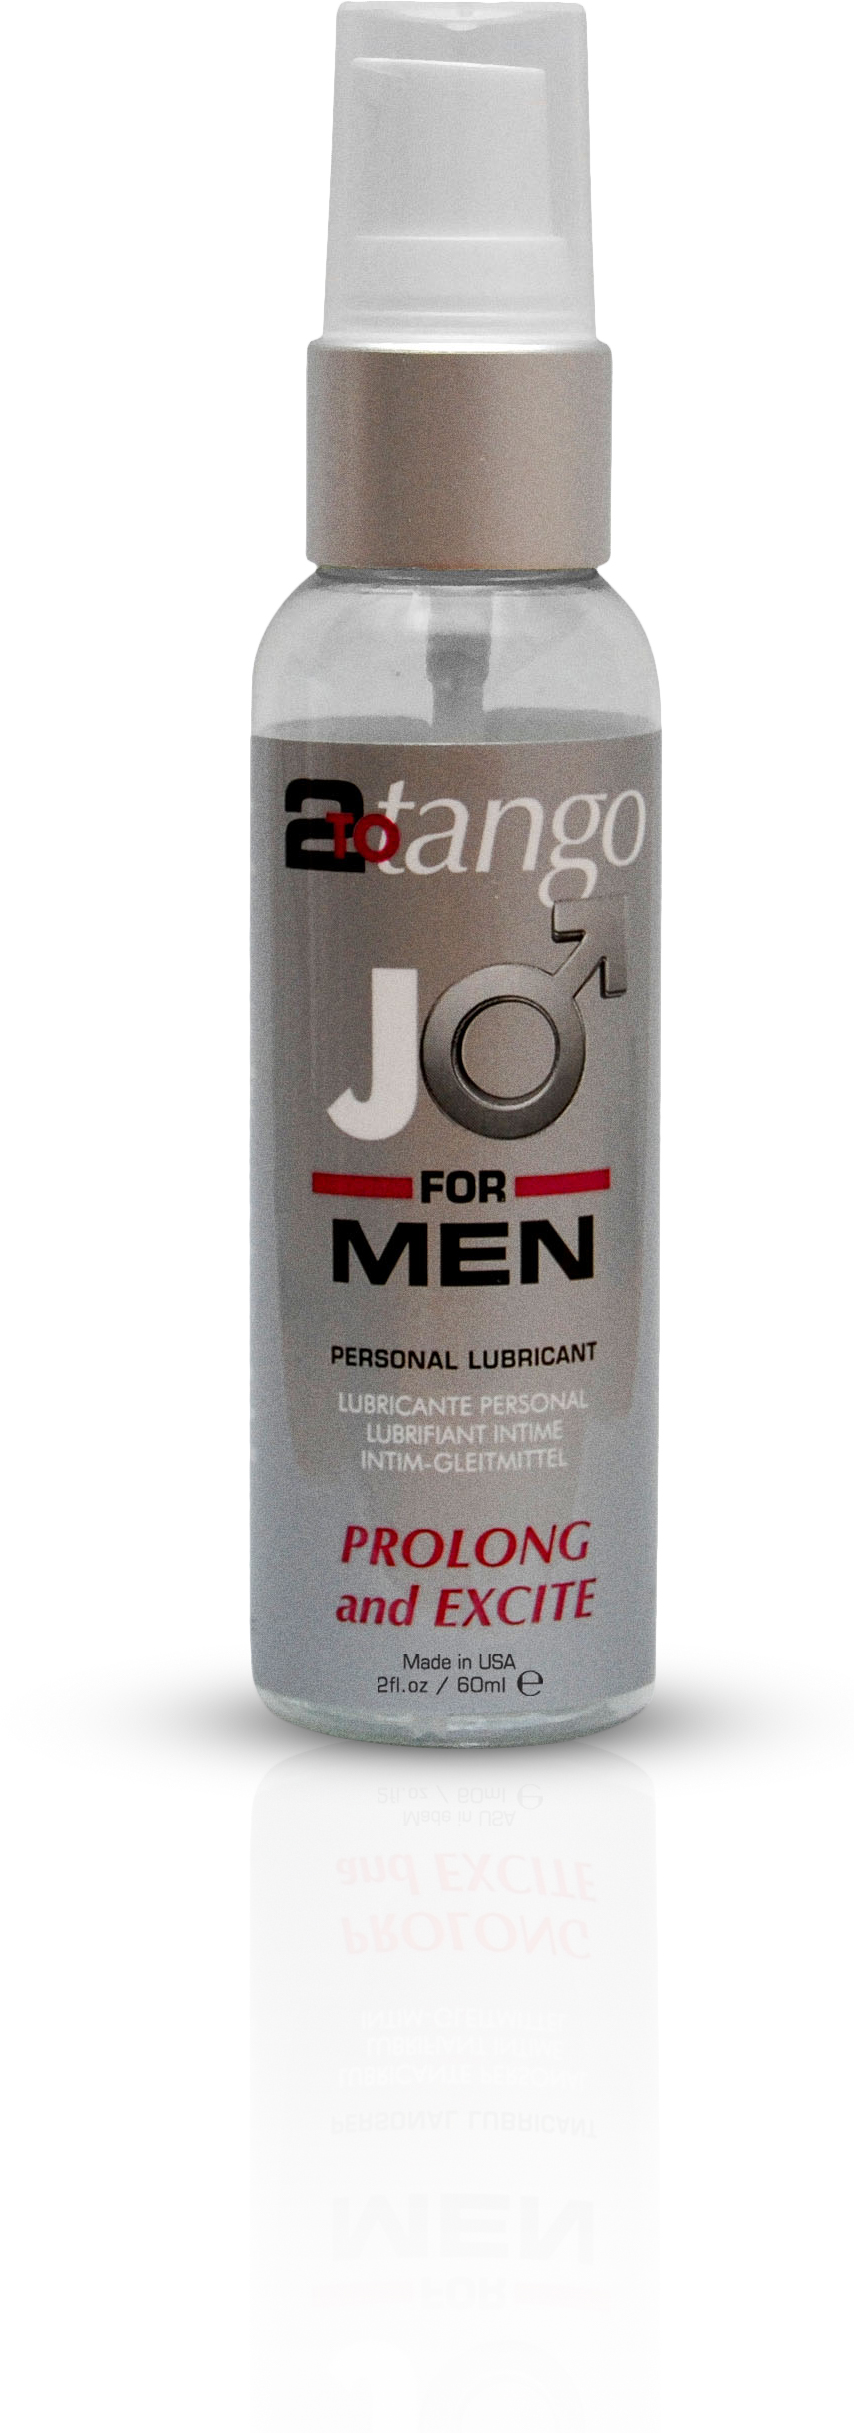 JO_2_to_tango_mens_2oz.jpg